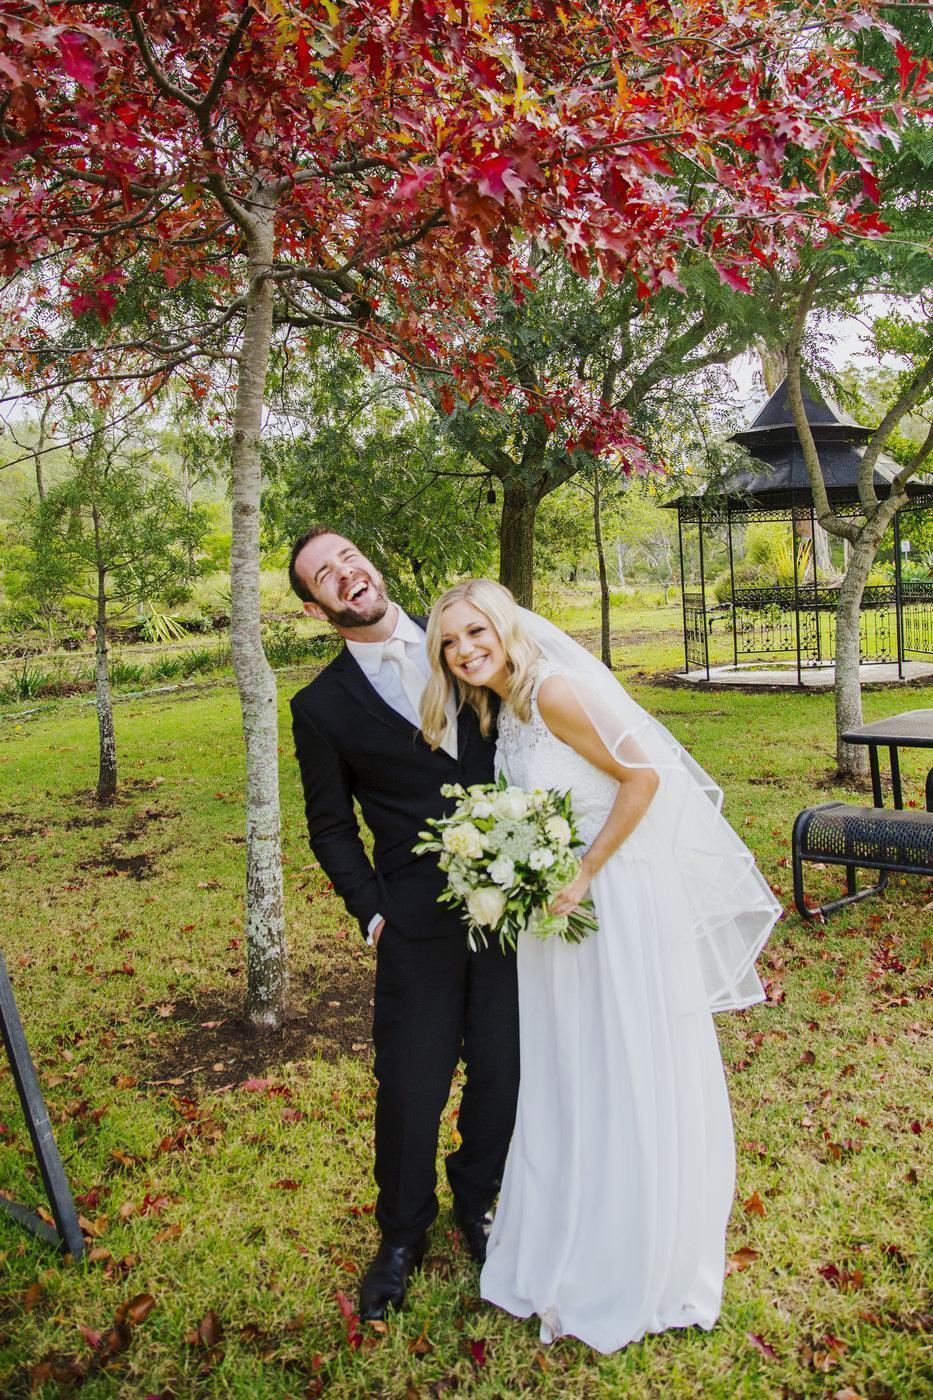 Wedding Photography couple laughing